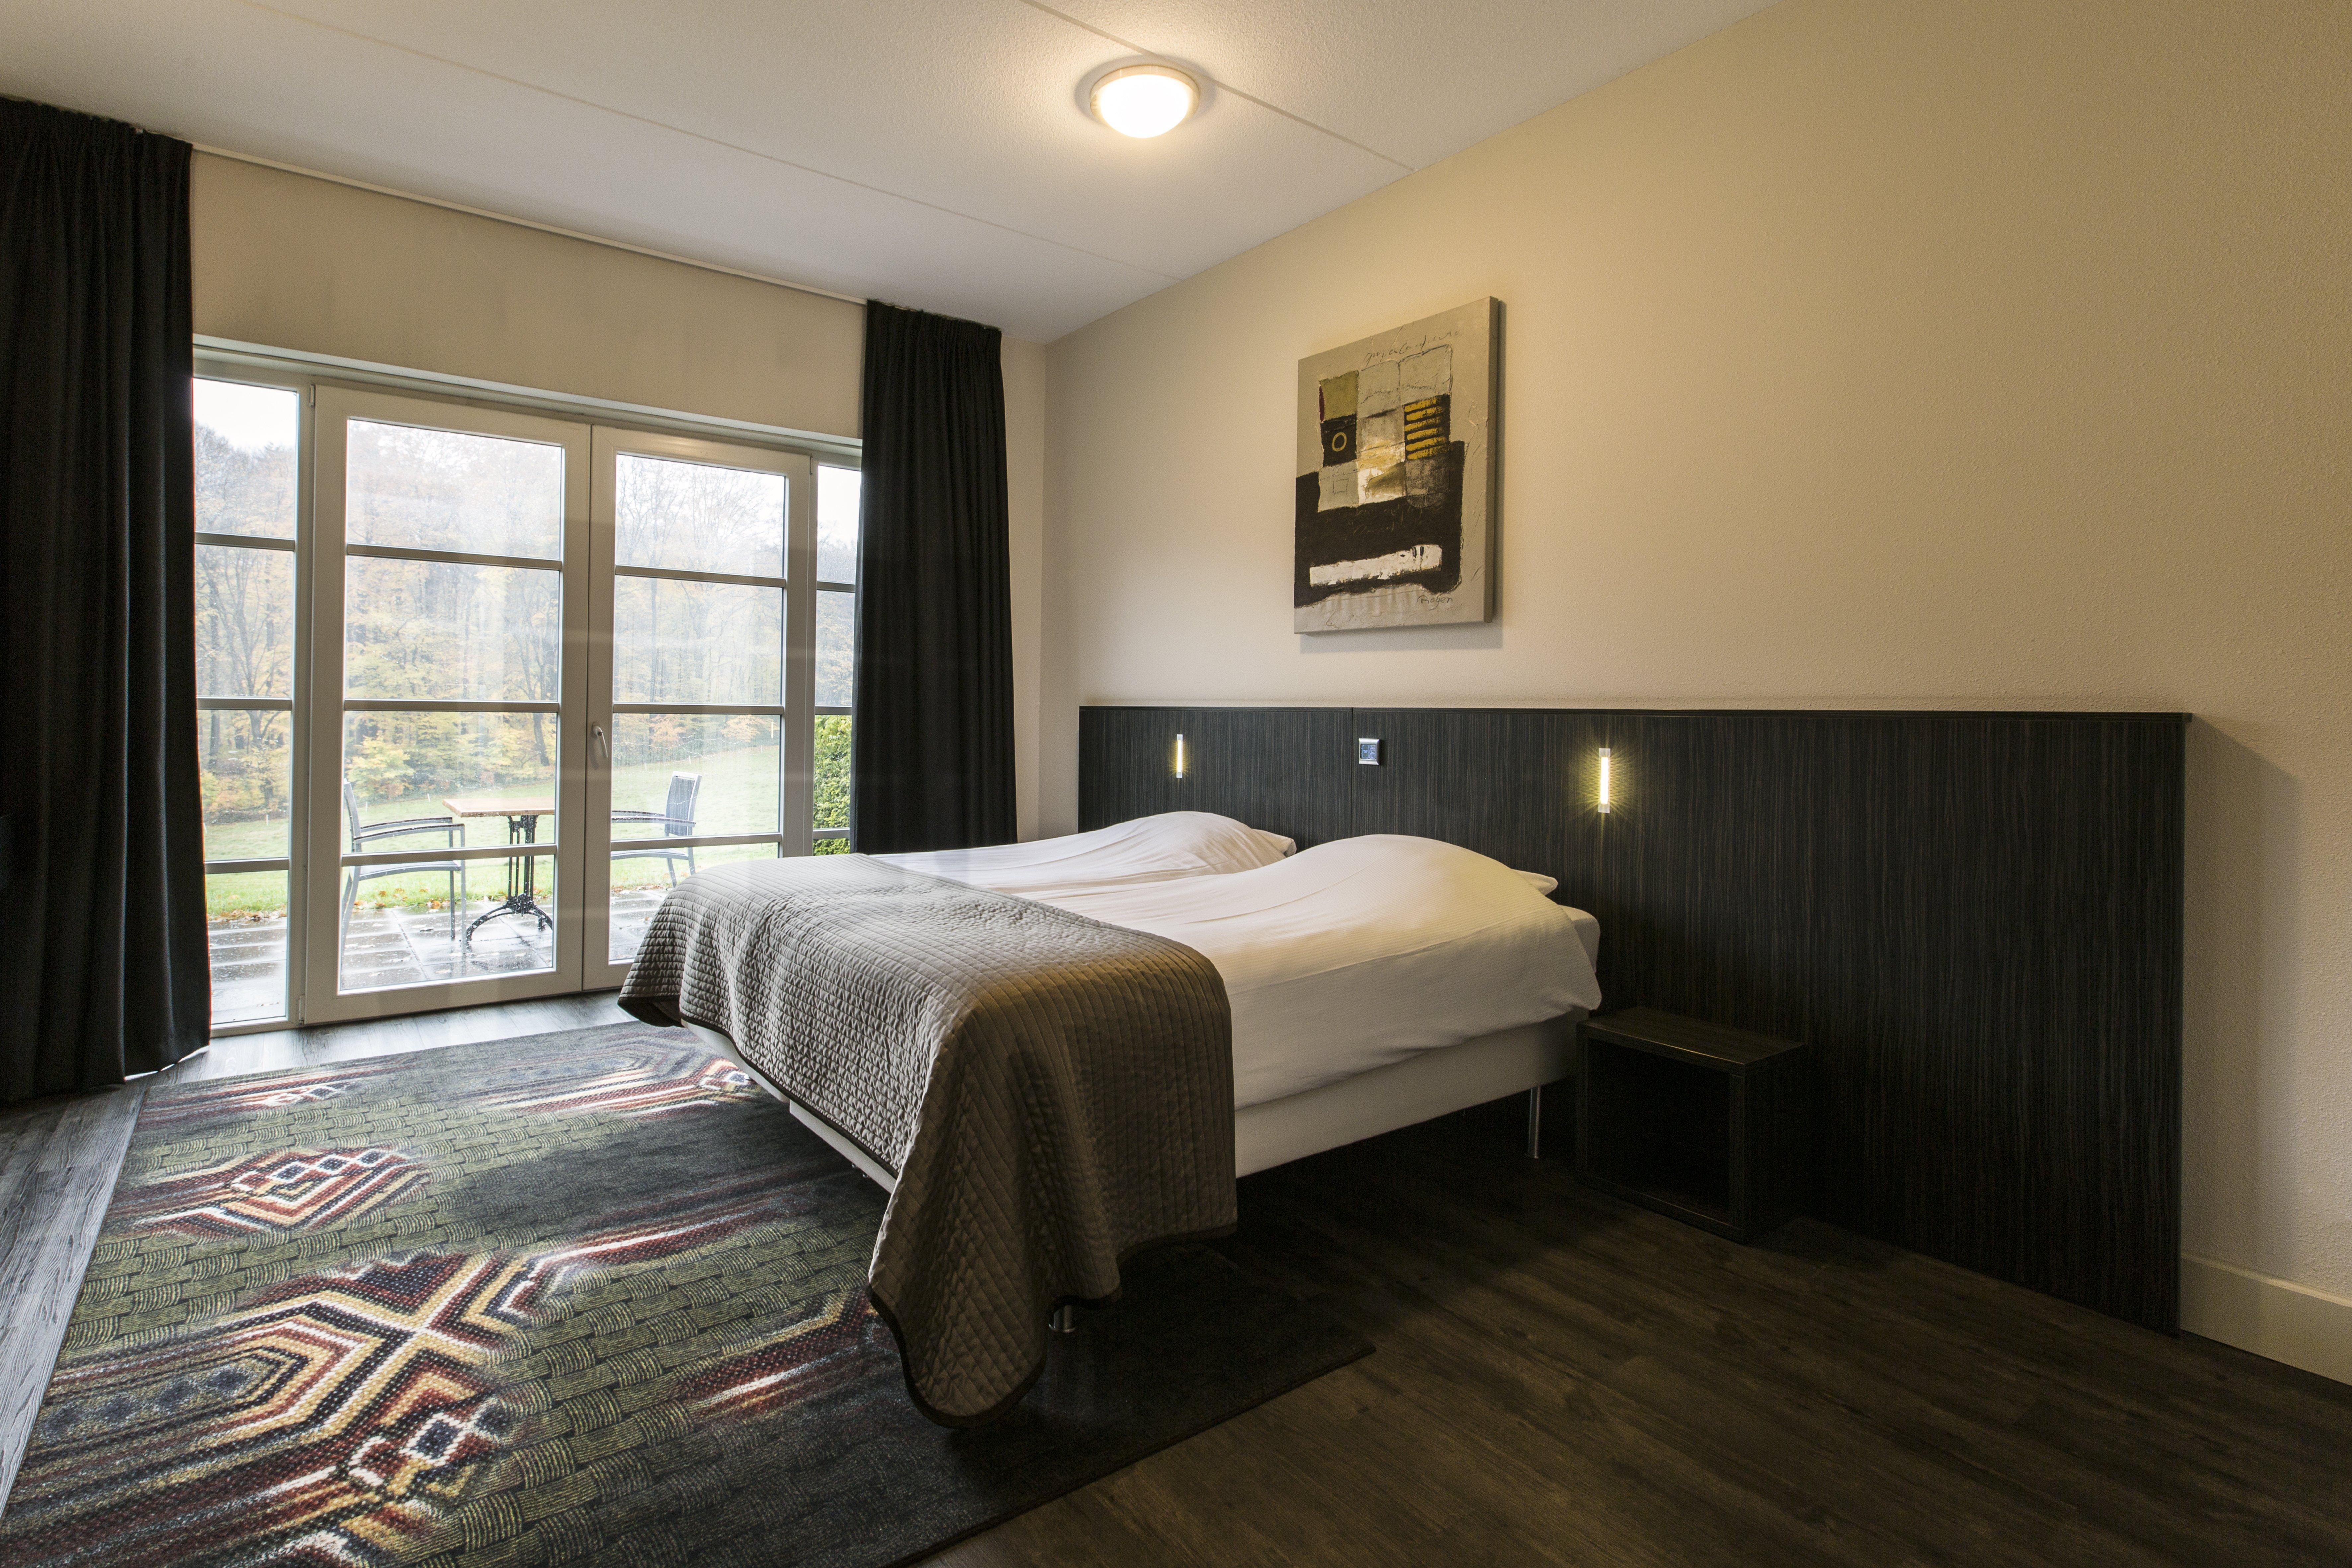 Fletcher Landgoed Hotel Holthurnsche Hof